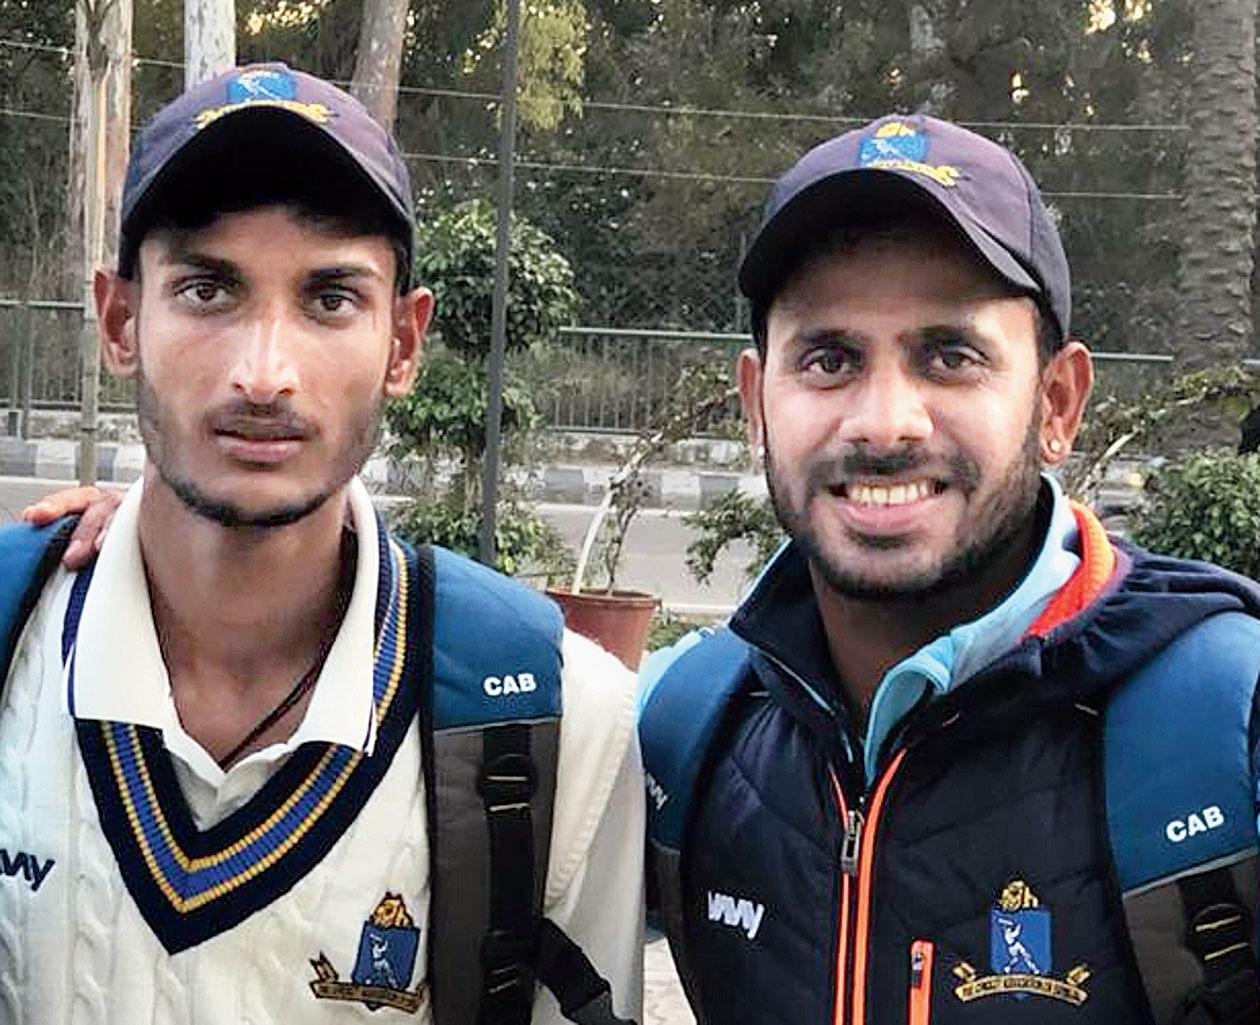 Shahbaz Ahmed (left) and Manoj Tiwary on Thursday